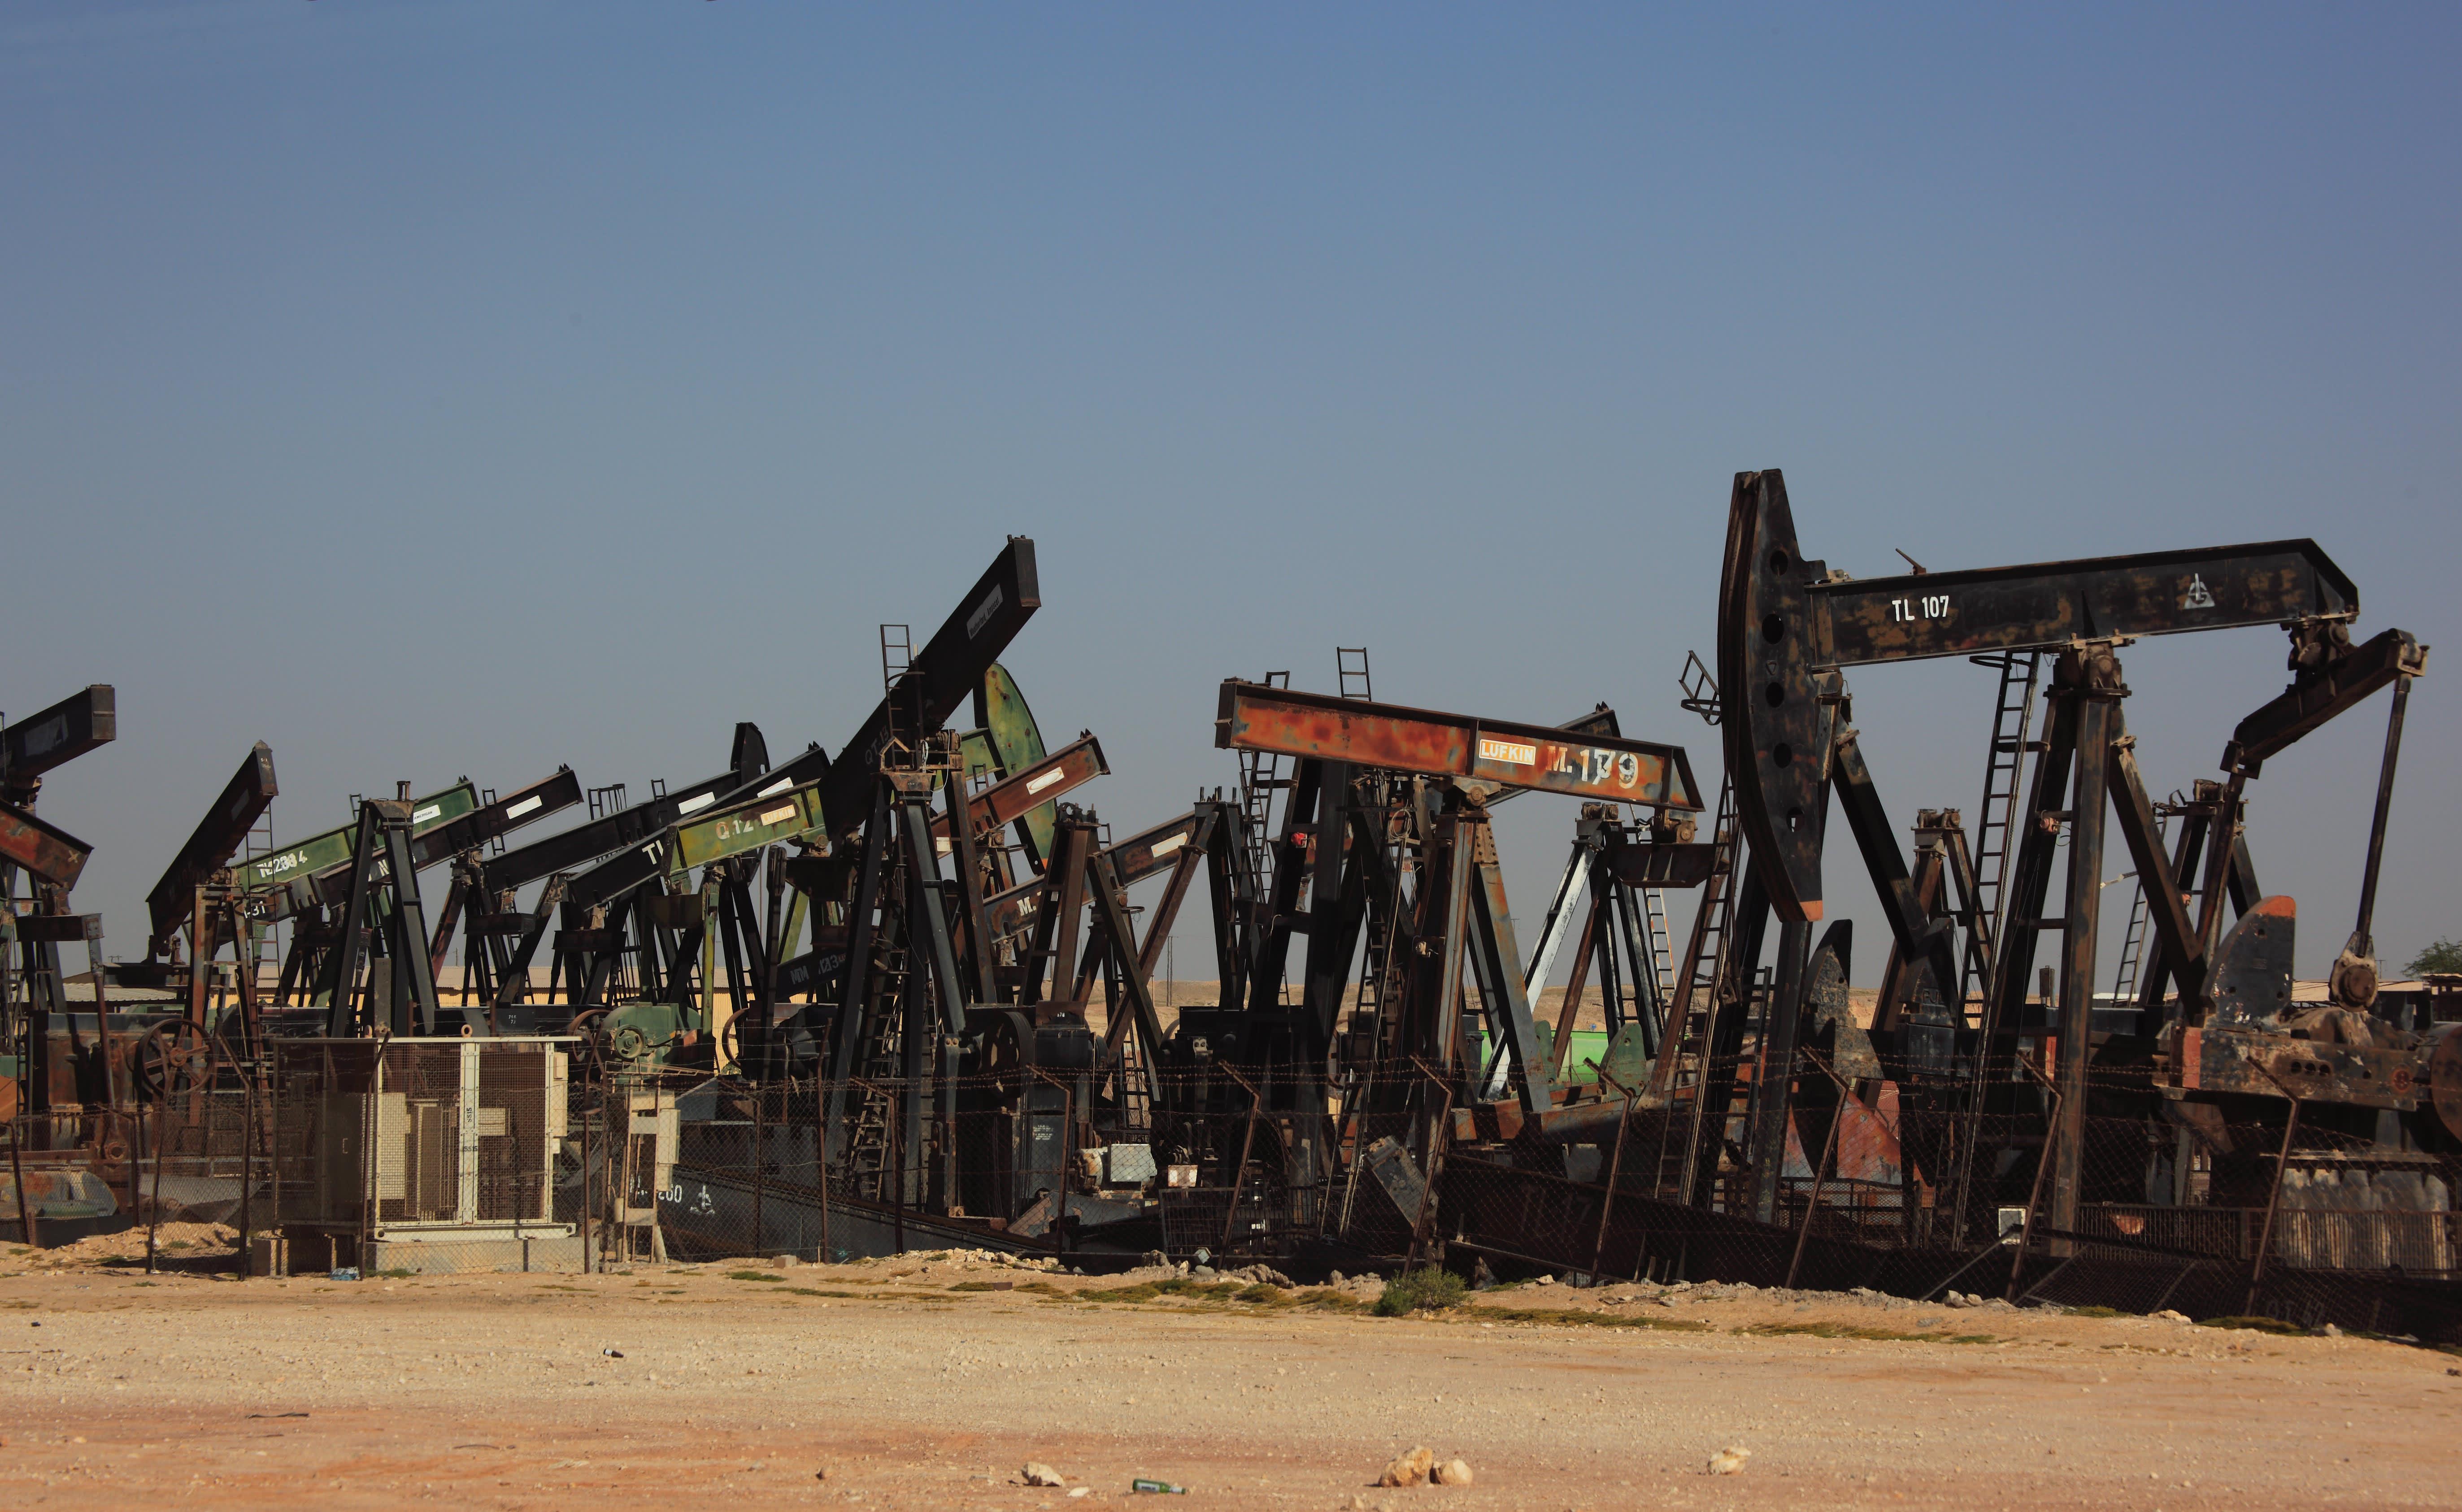 Saudi Arabia is set to lead a trillion-dollar regional energy splurge